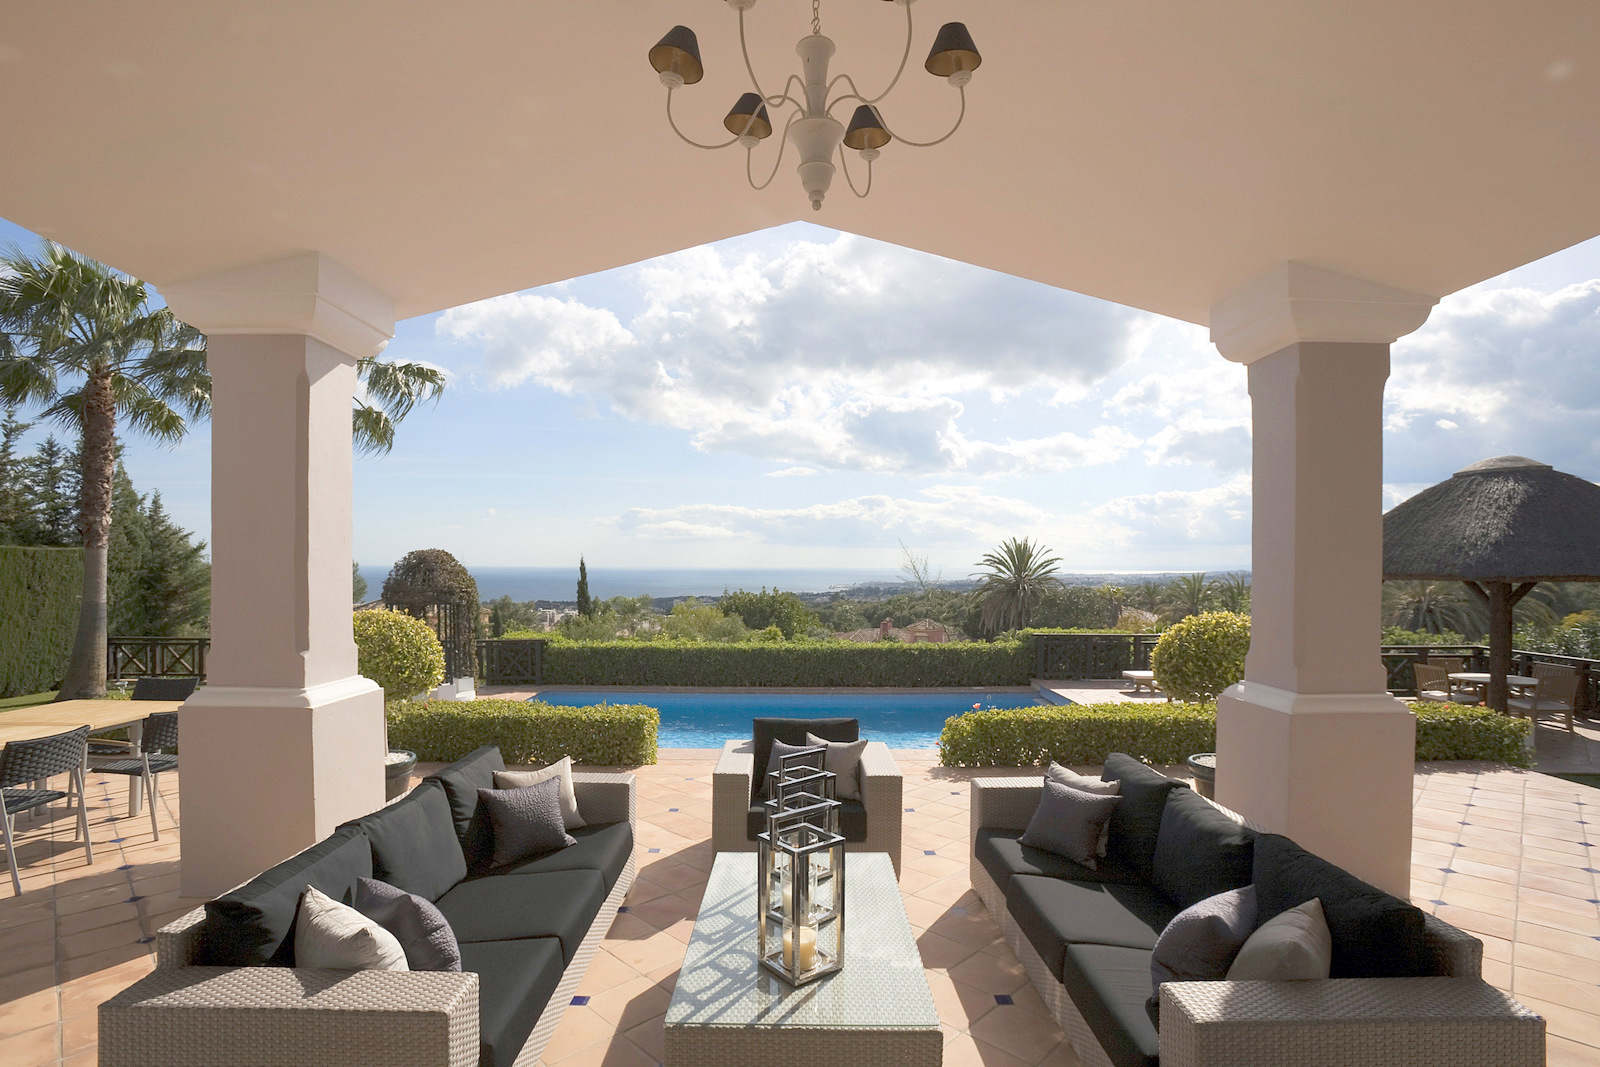 Style, refinement and comfort in Sierra Blanca, Marbella